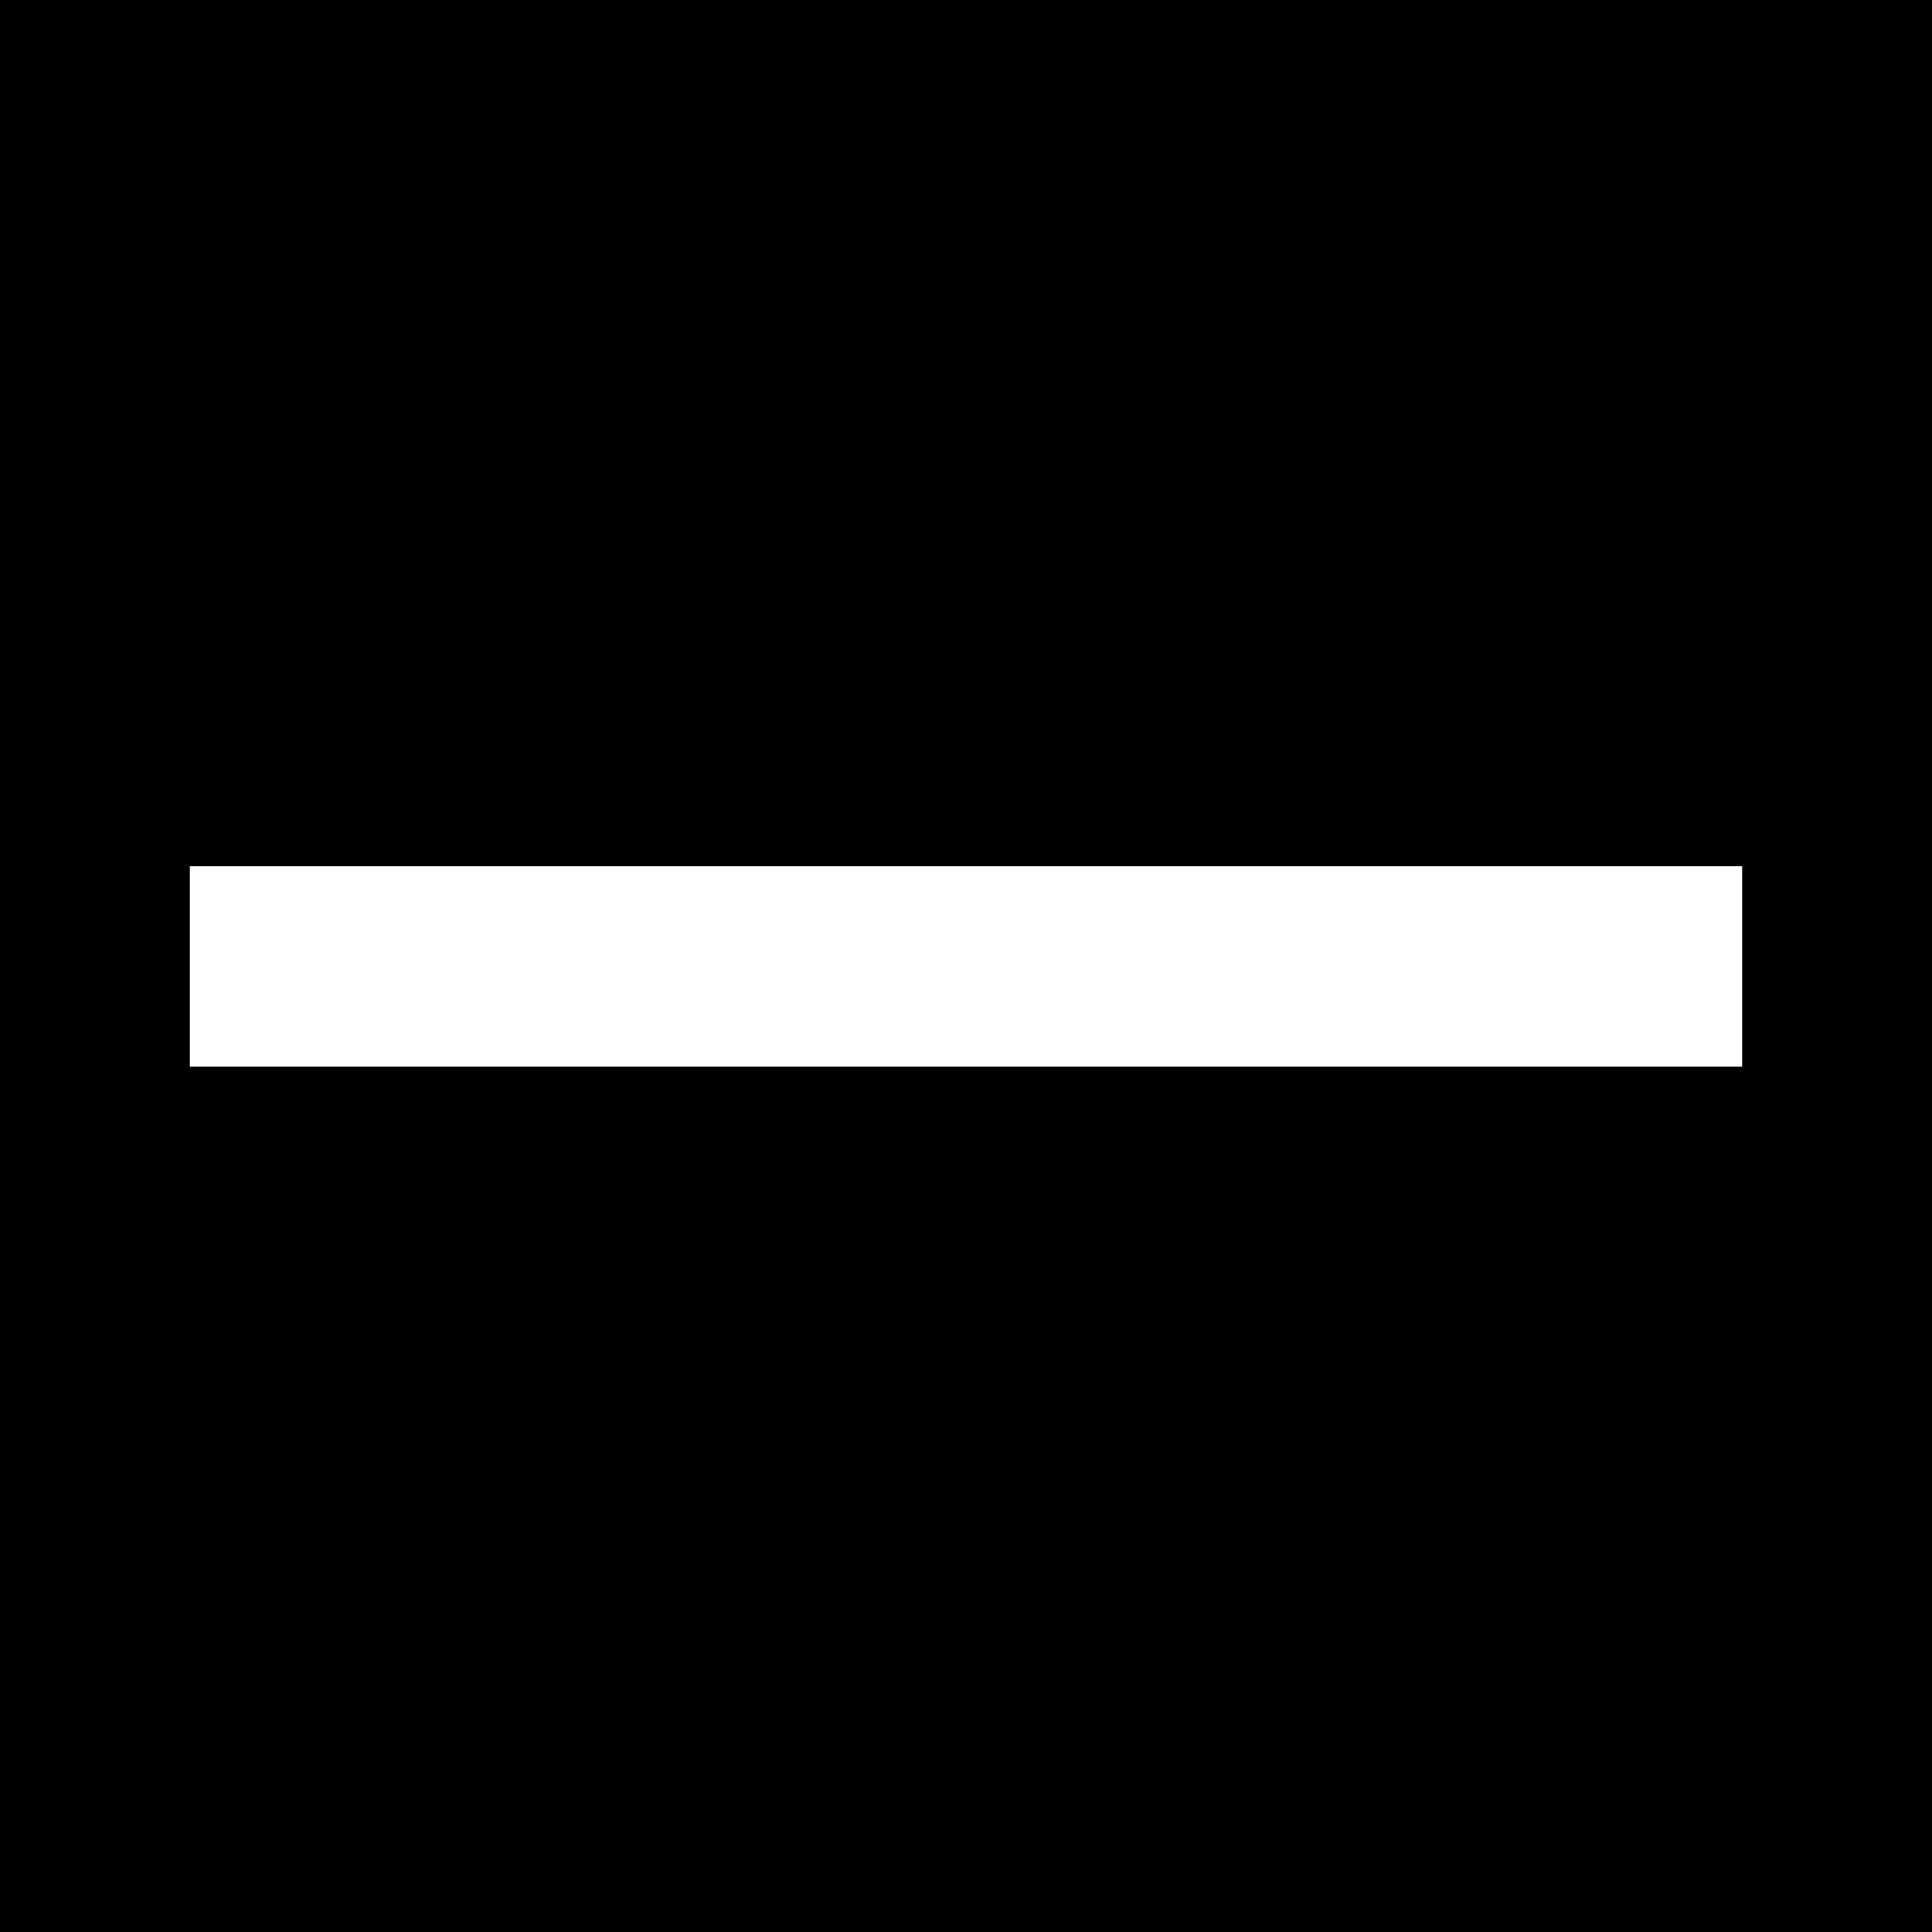 Transfer TV5Monde